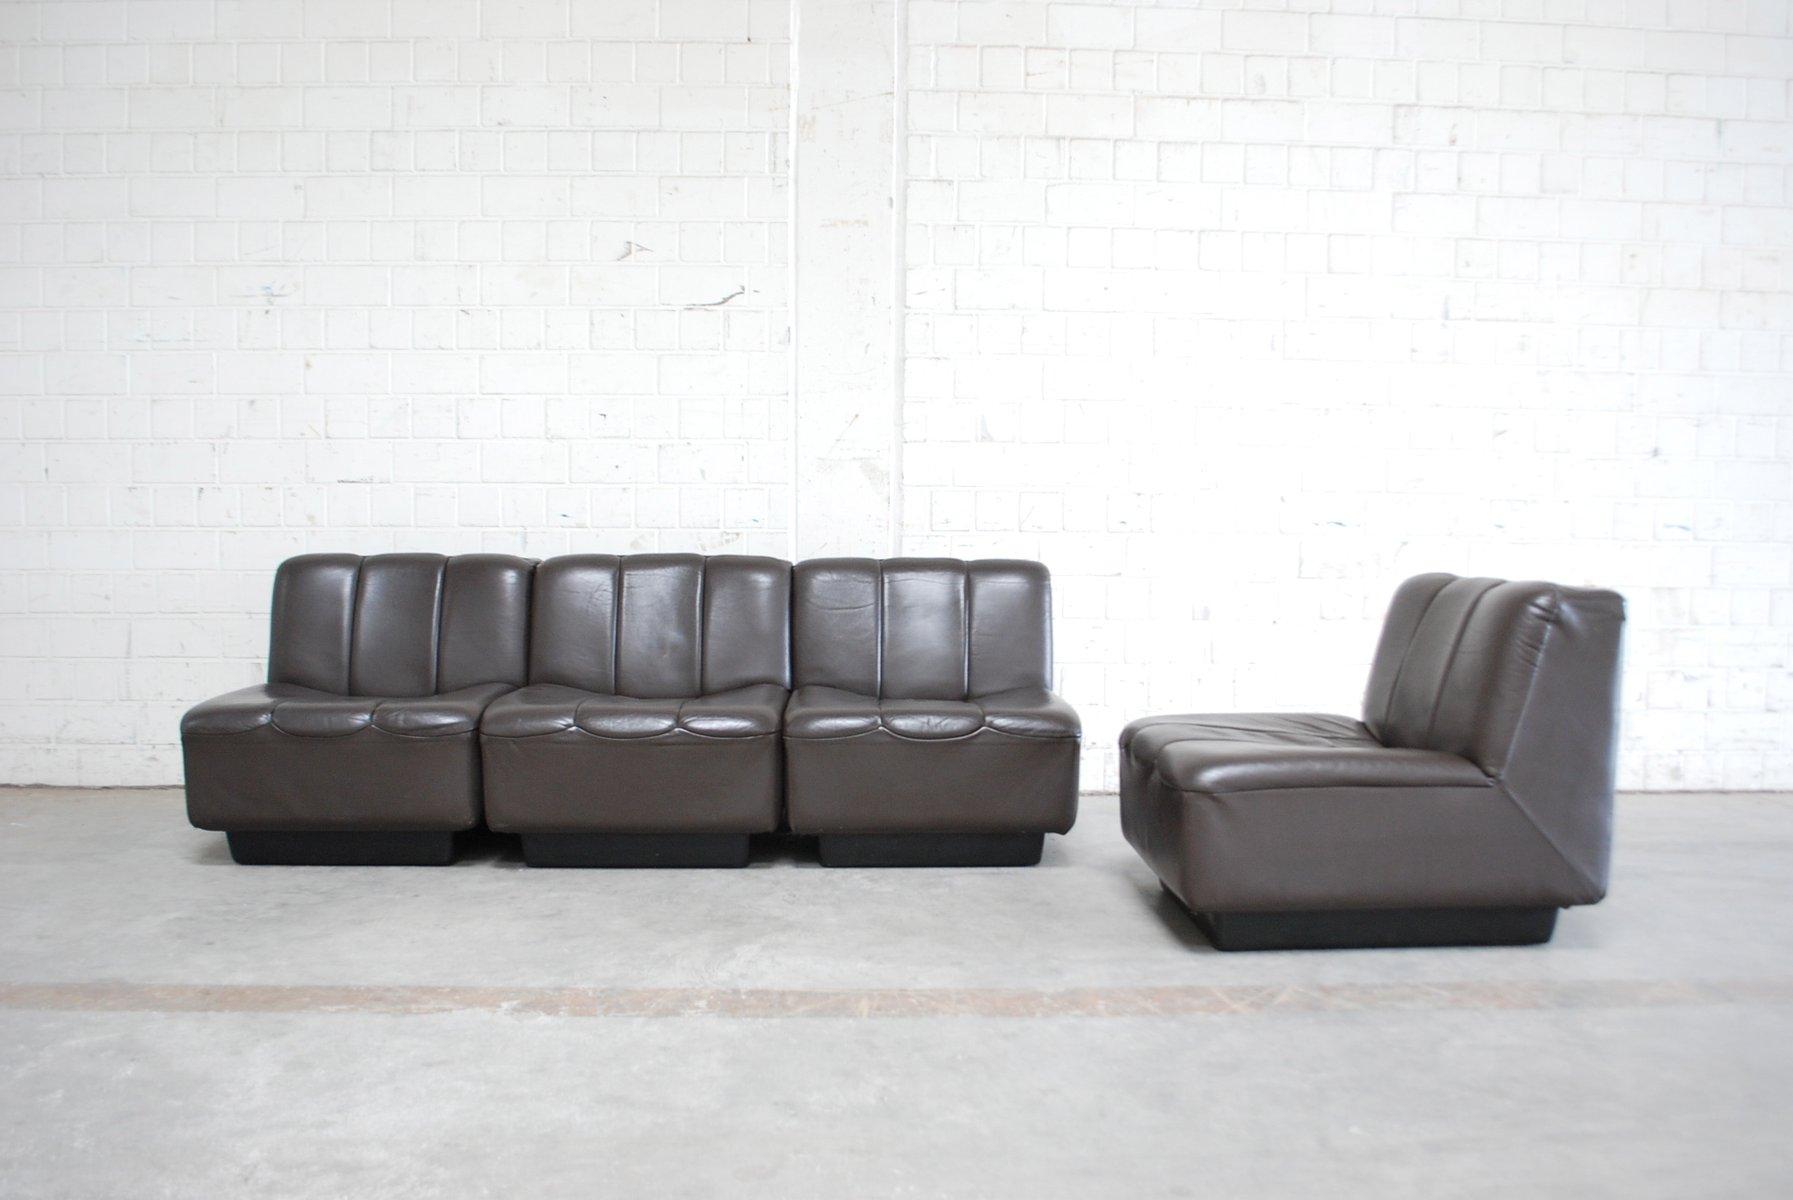 Vintage Modular Brown Leather Sofa, 1970s